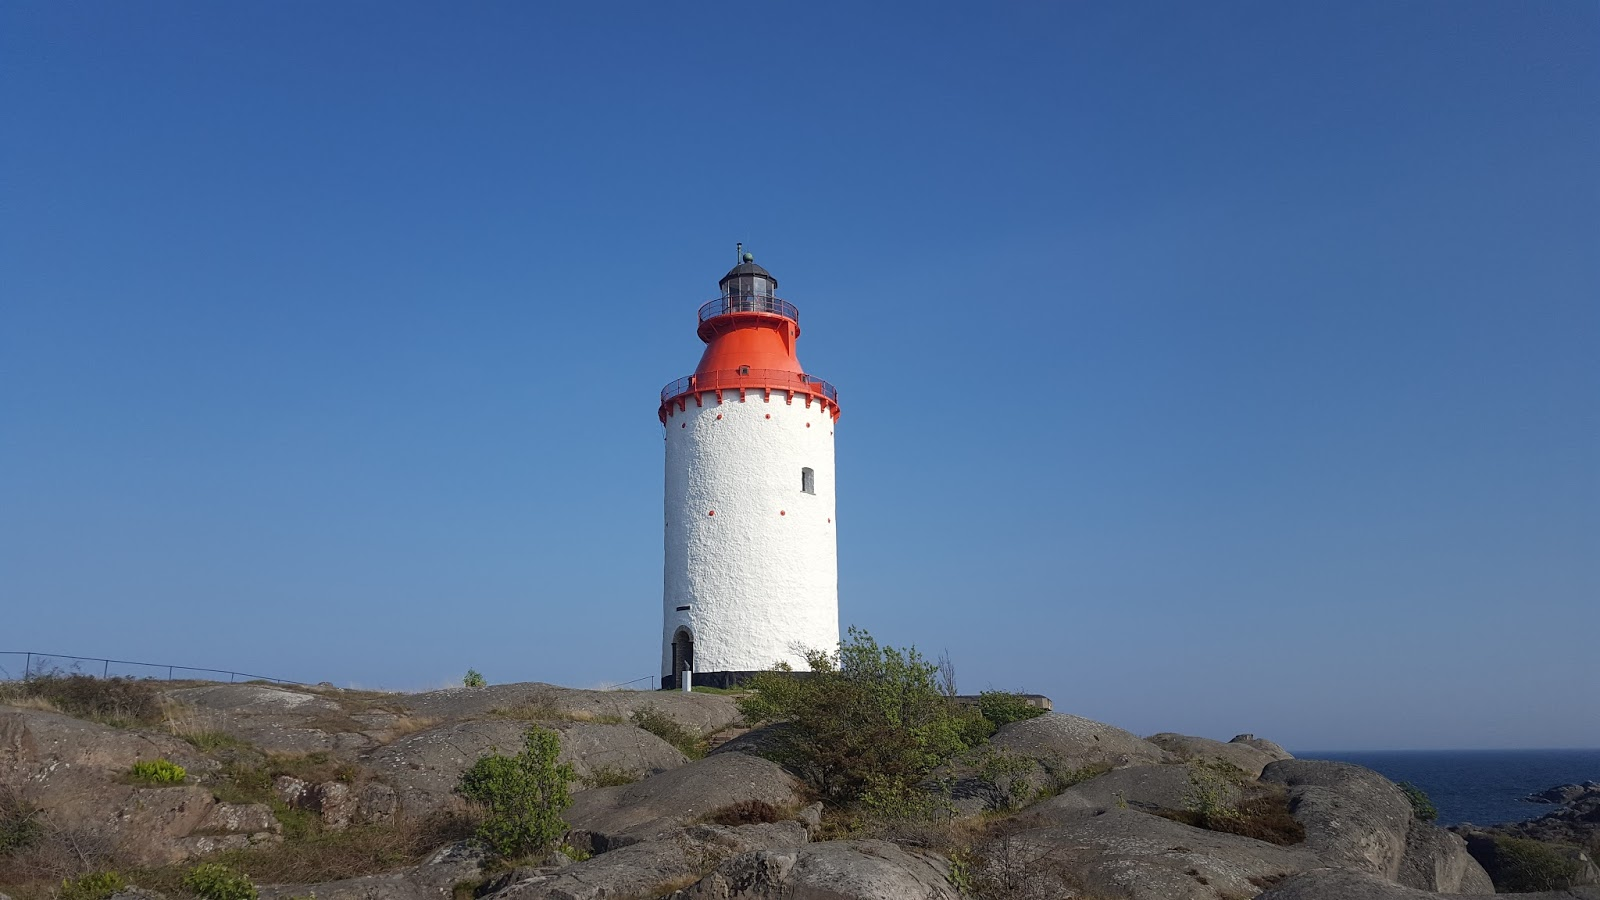 landsort men Arholma-landsort and gotland: your guide to the hin the stockholm archipelago [lars hassler, lars granath, katarina sjowall trodden] on.